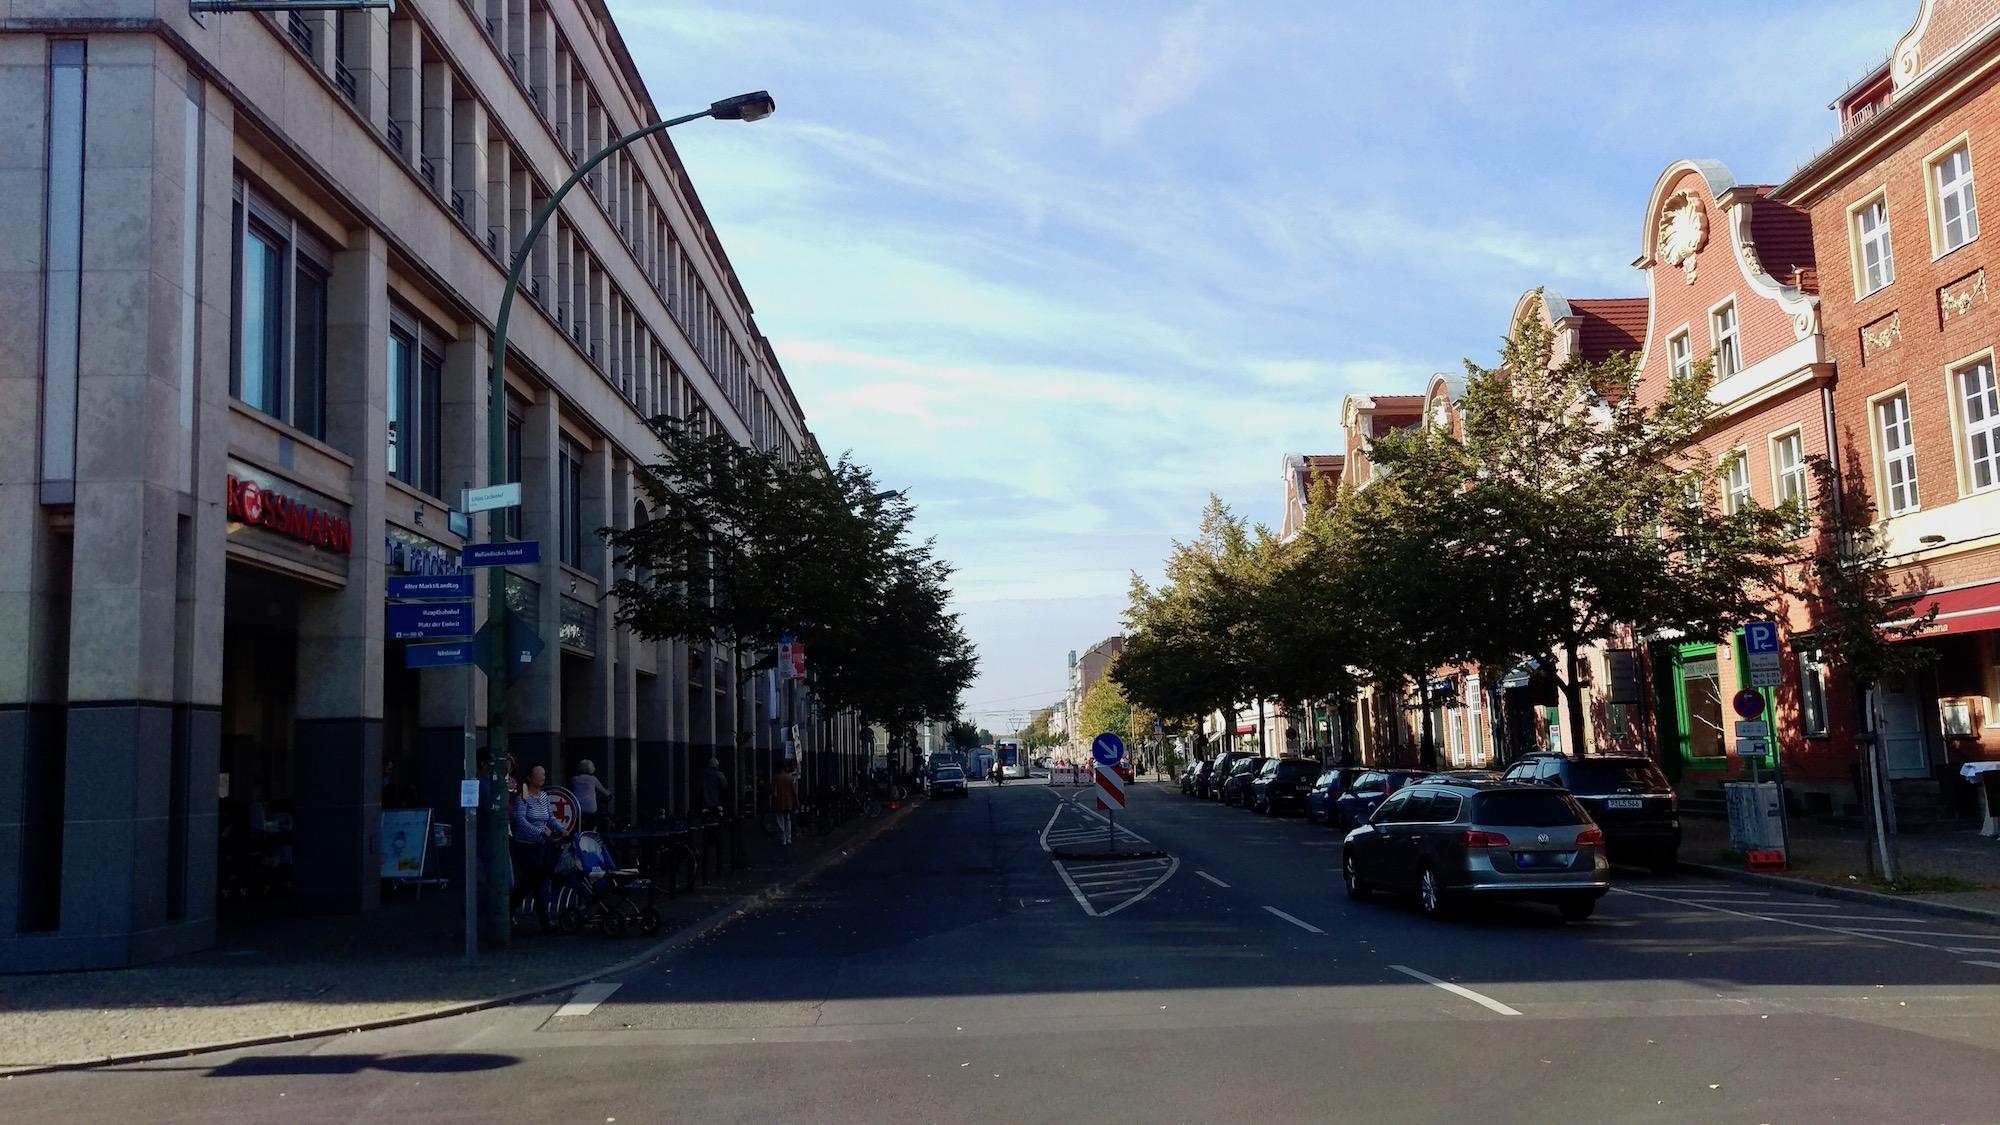 The beginning of Dutch Quarter in Potsdam.